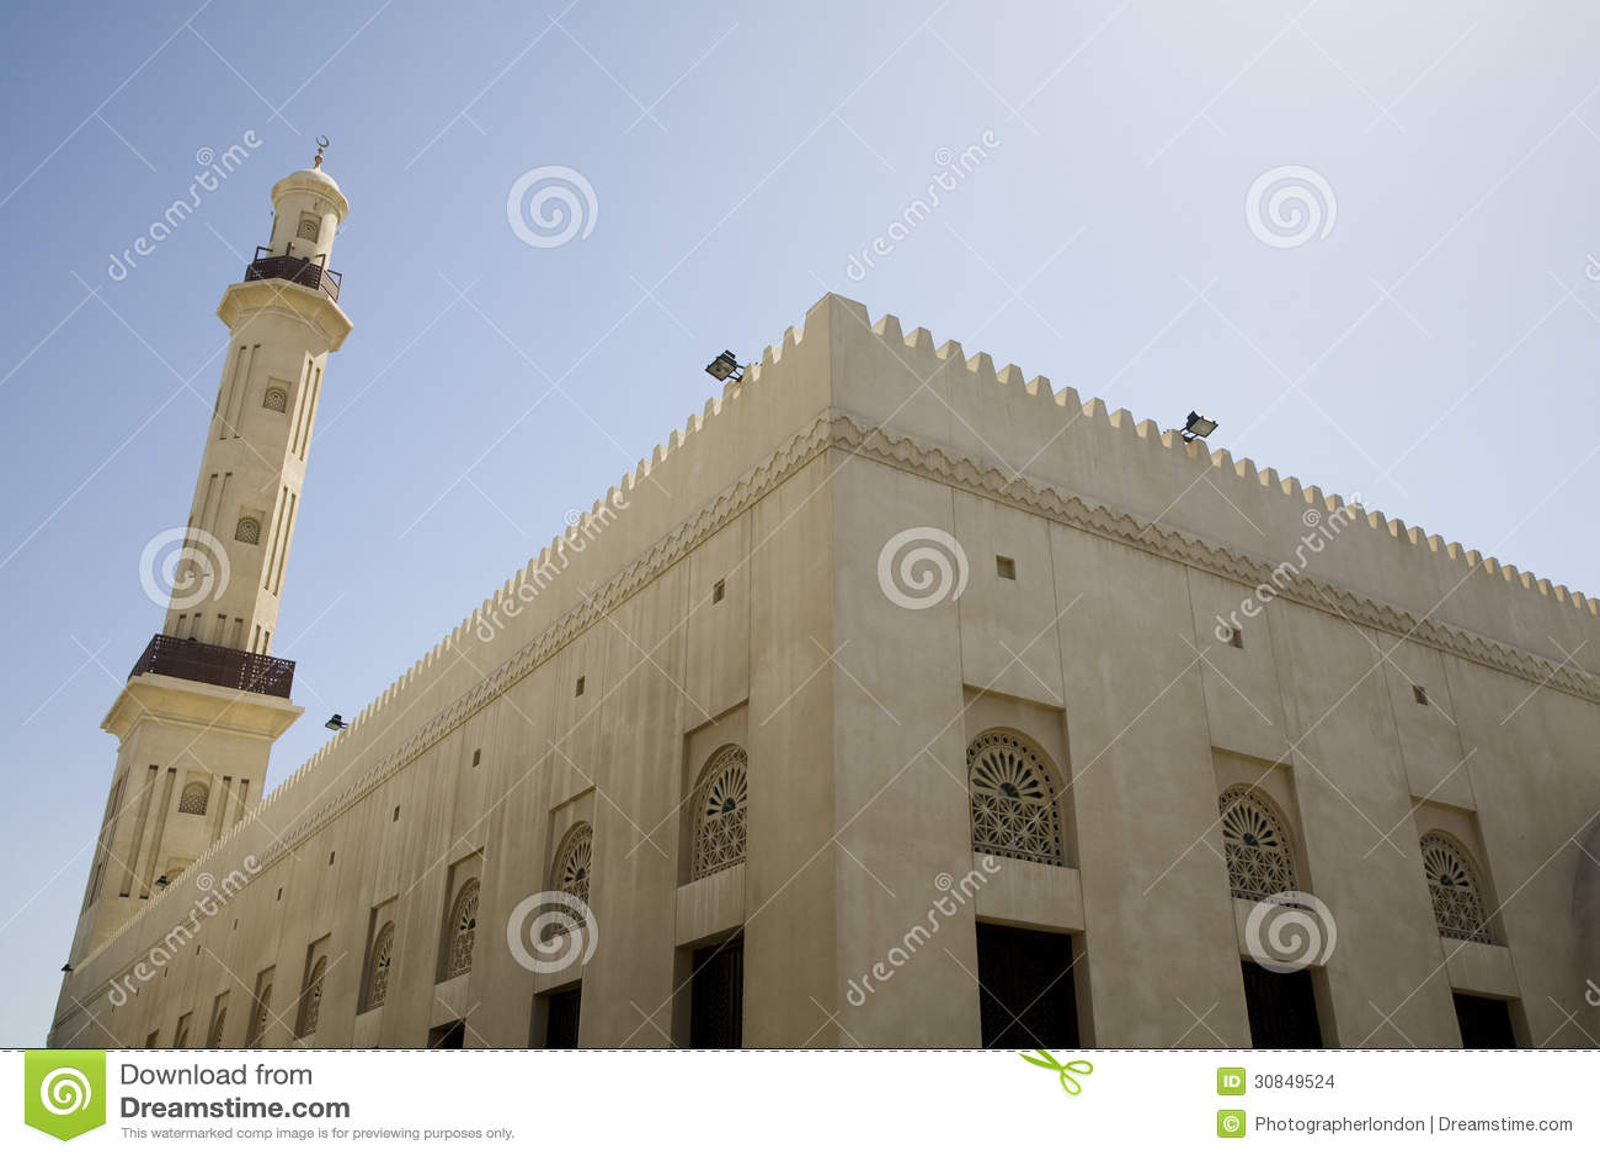 bur dubai muslim Iranian mosque, bur dubai 81 likes the iranian mosque is a shia mosque located near the old textile souk in the bur dubai district of dubai, united.